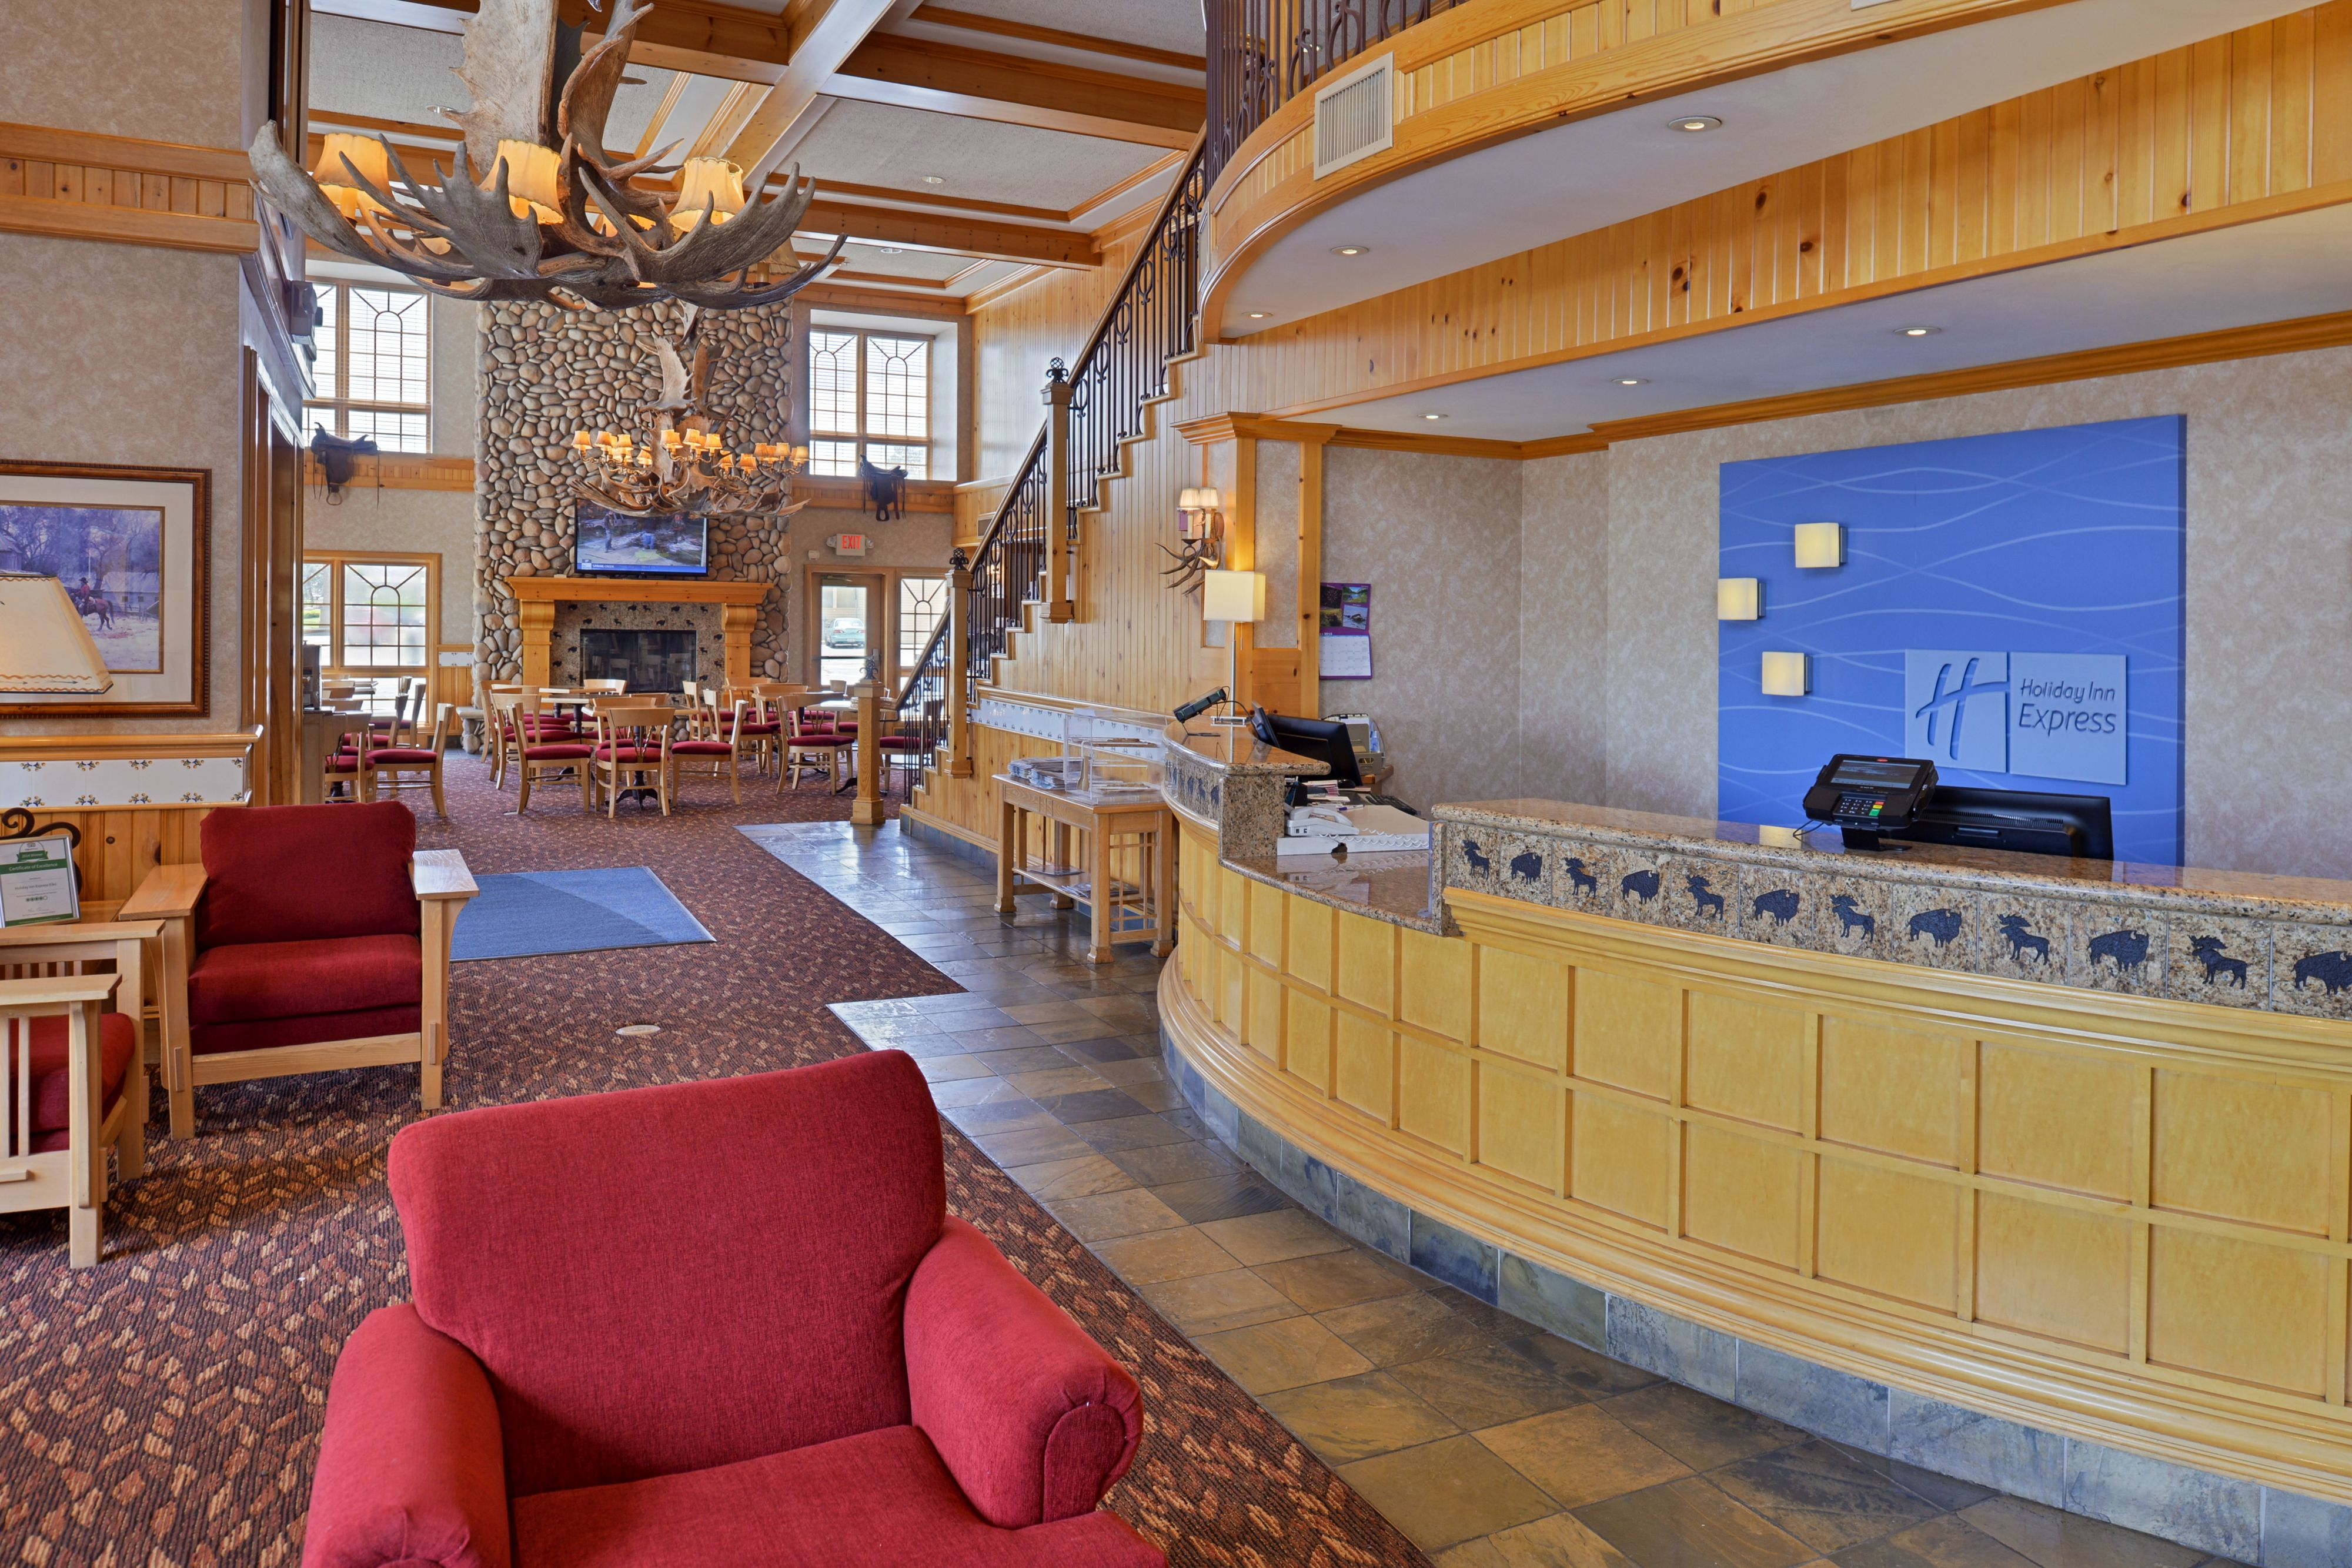 Holiday Inn Express & Suites Elko image 5